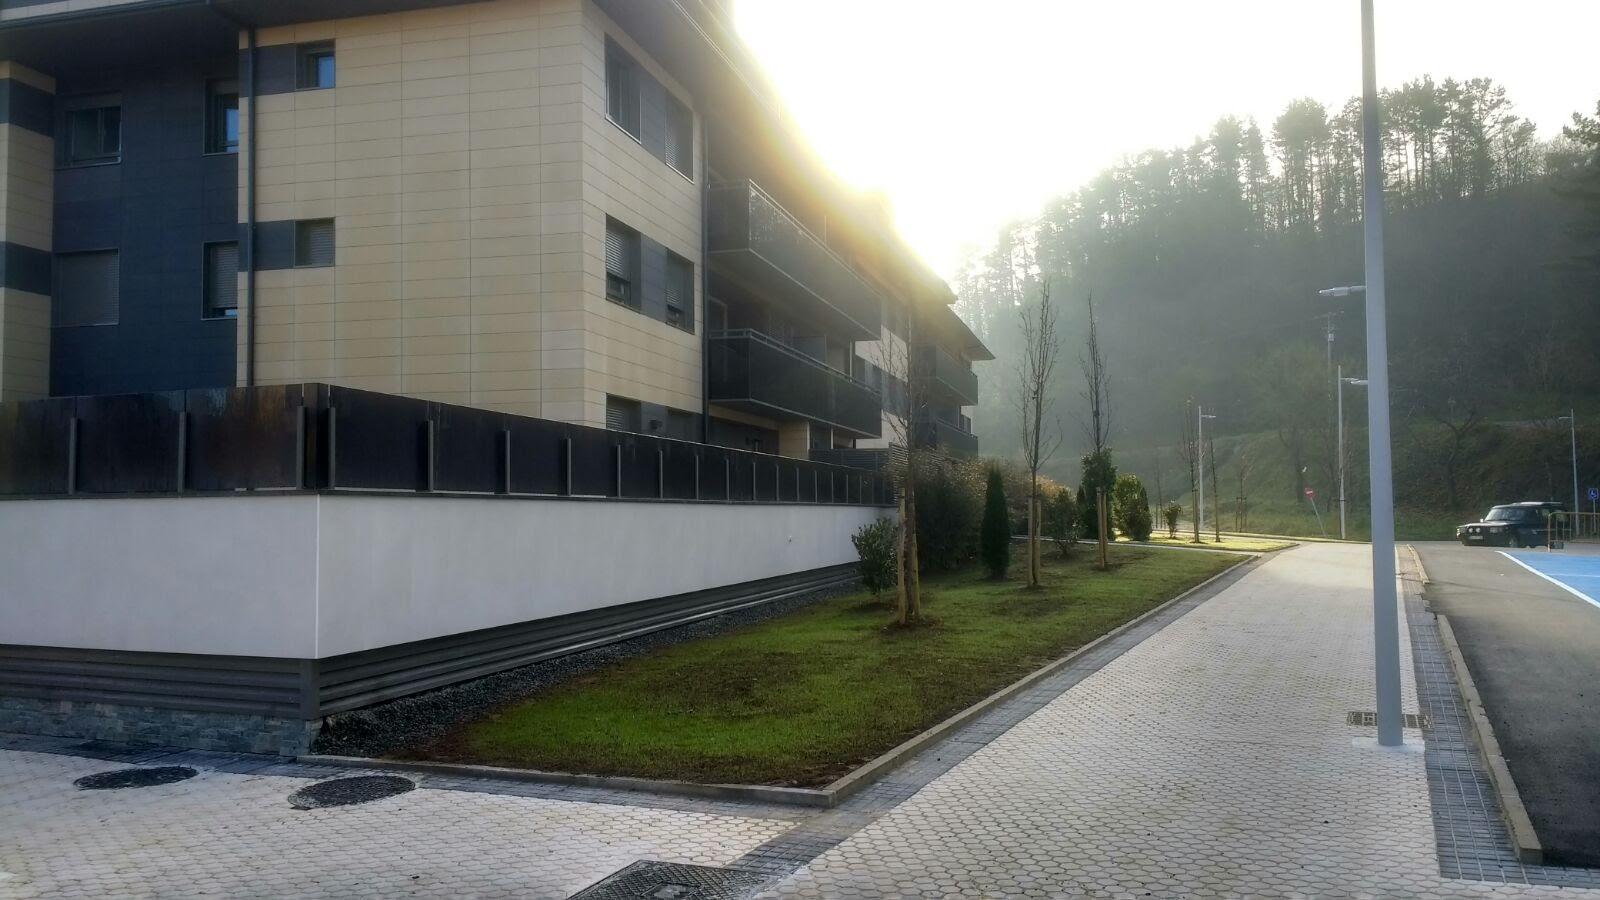 32 viviendas libres en asteasu construcciones sukia for Piscina zabalgana